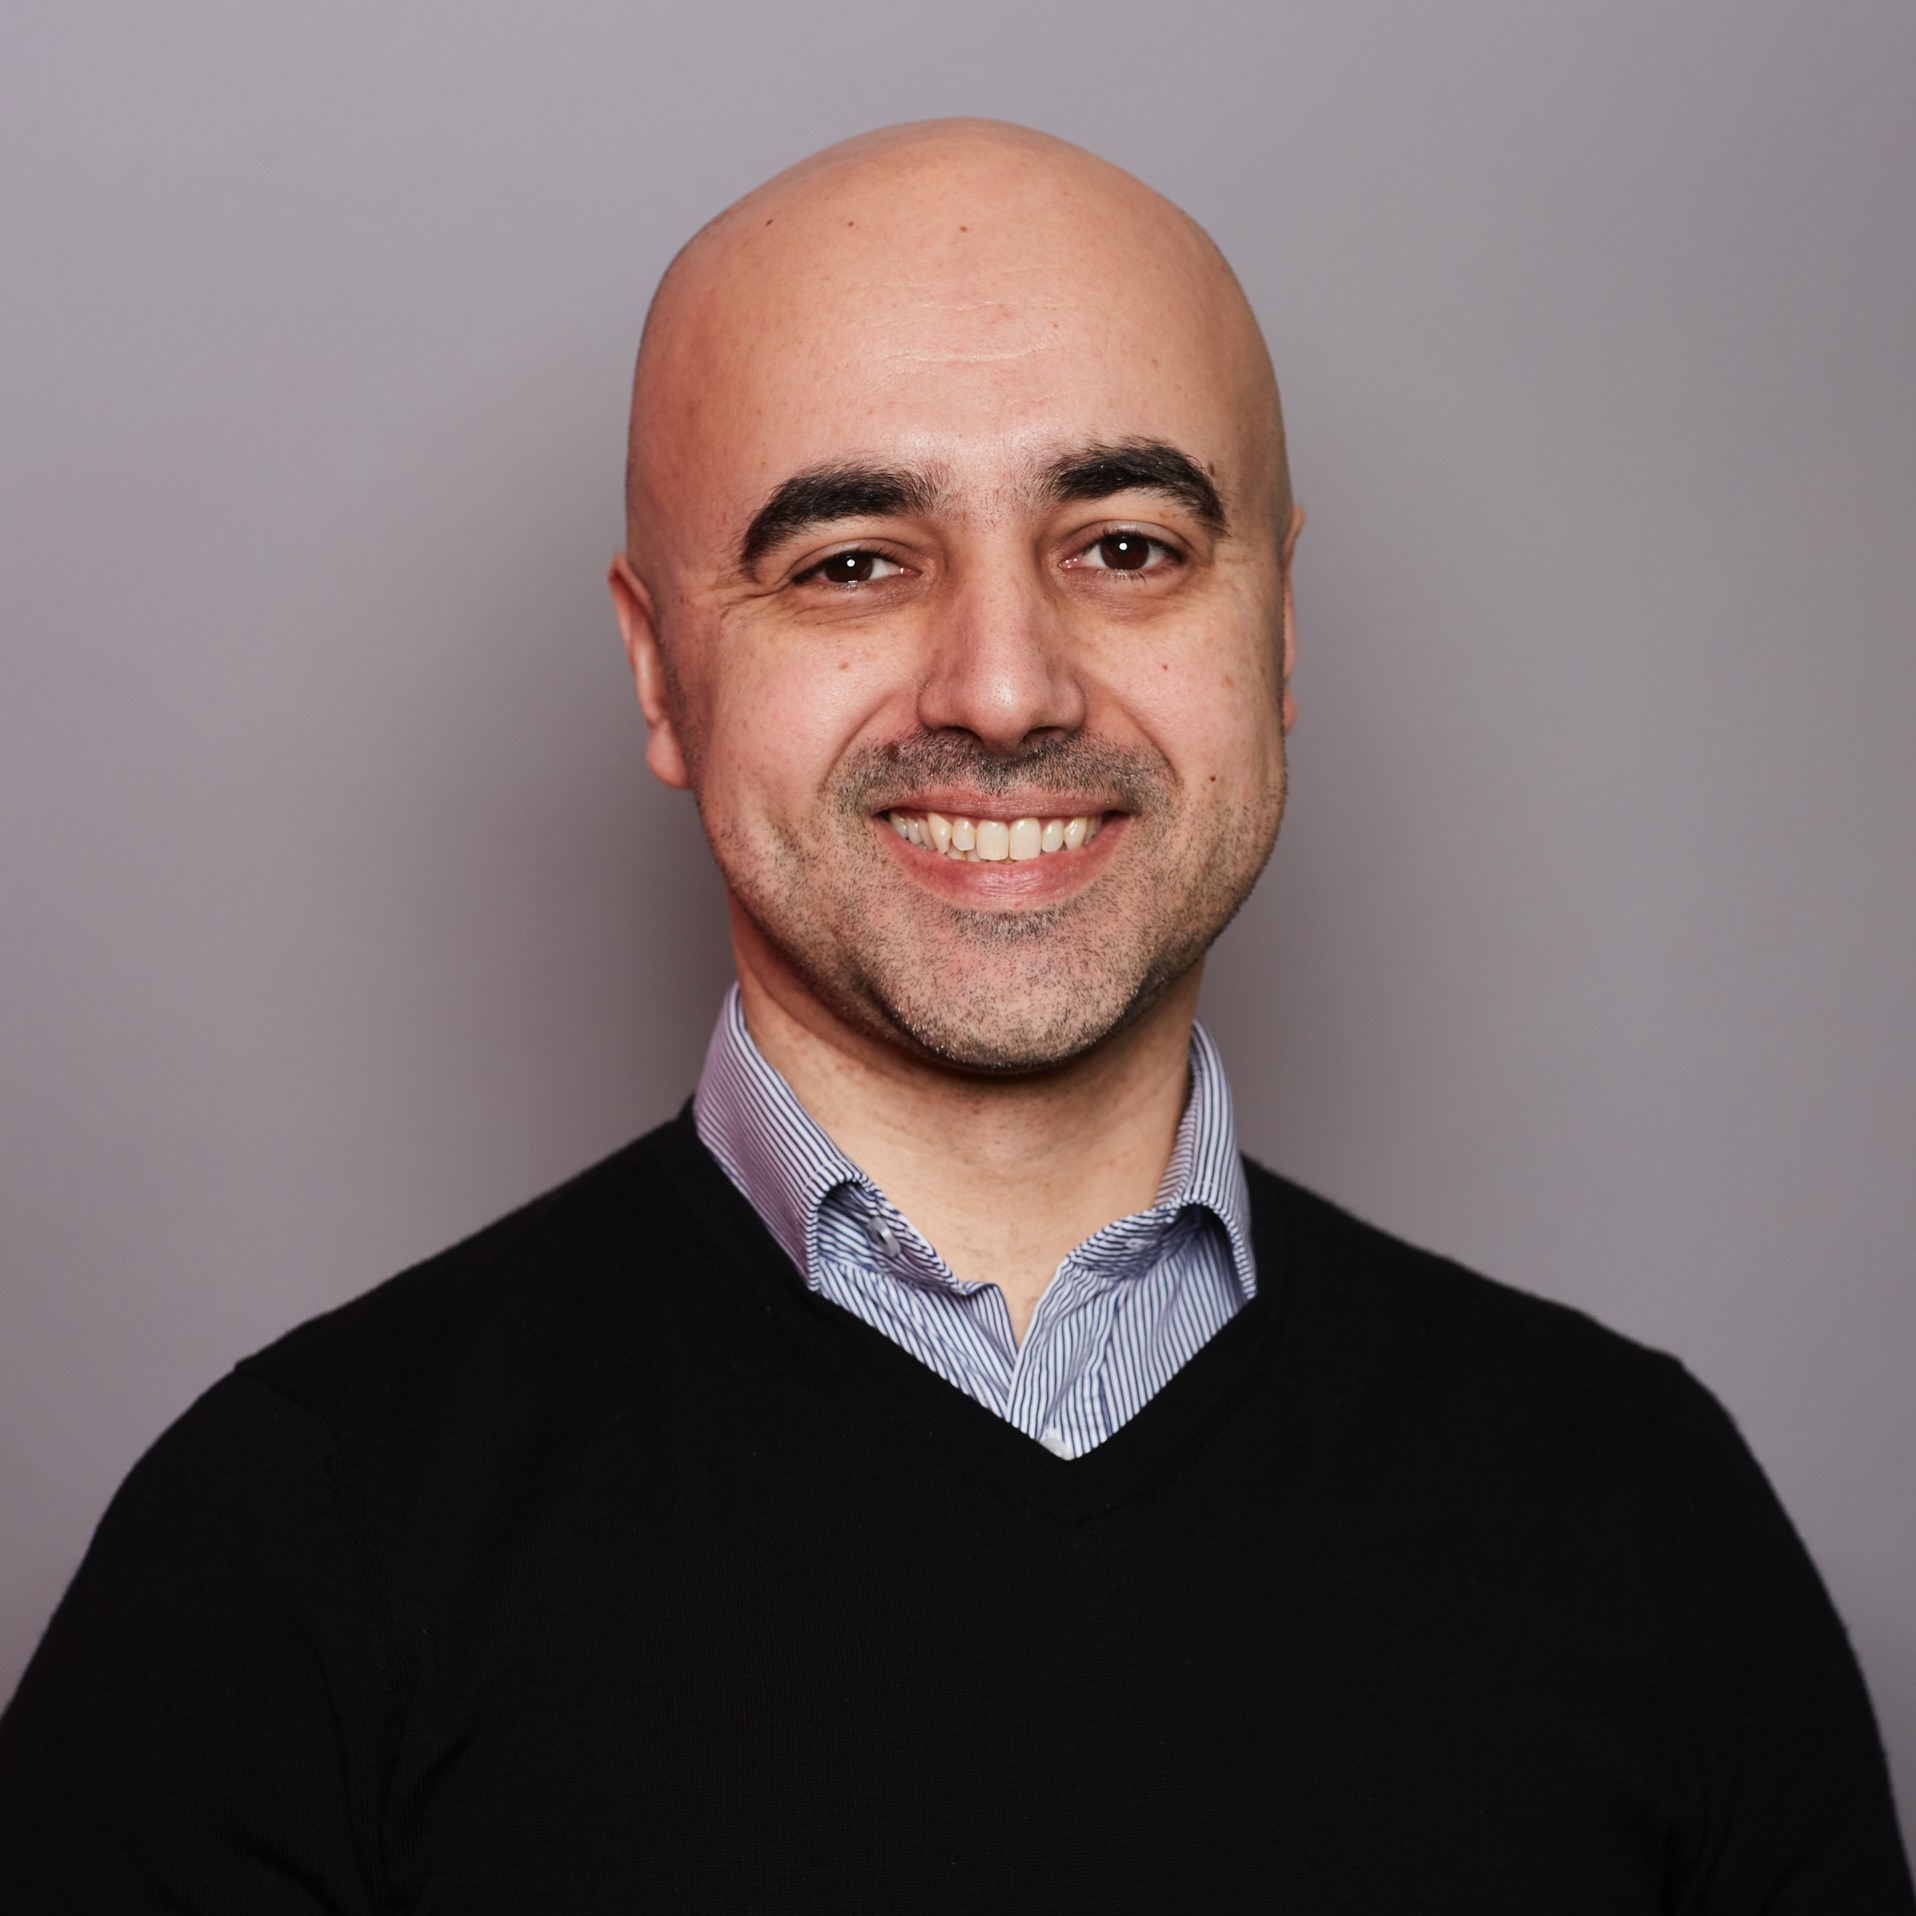 Pedro Mona, Global Director of Martech & Data, ForwardPMX